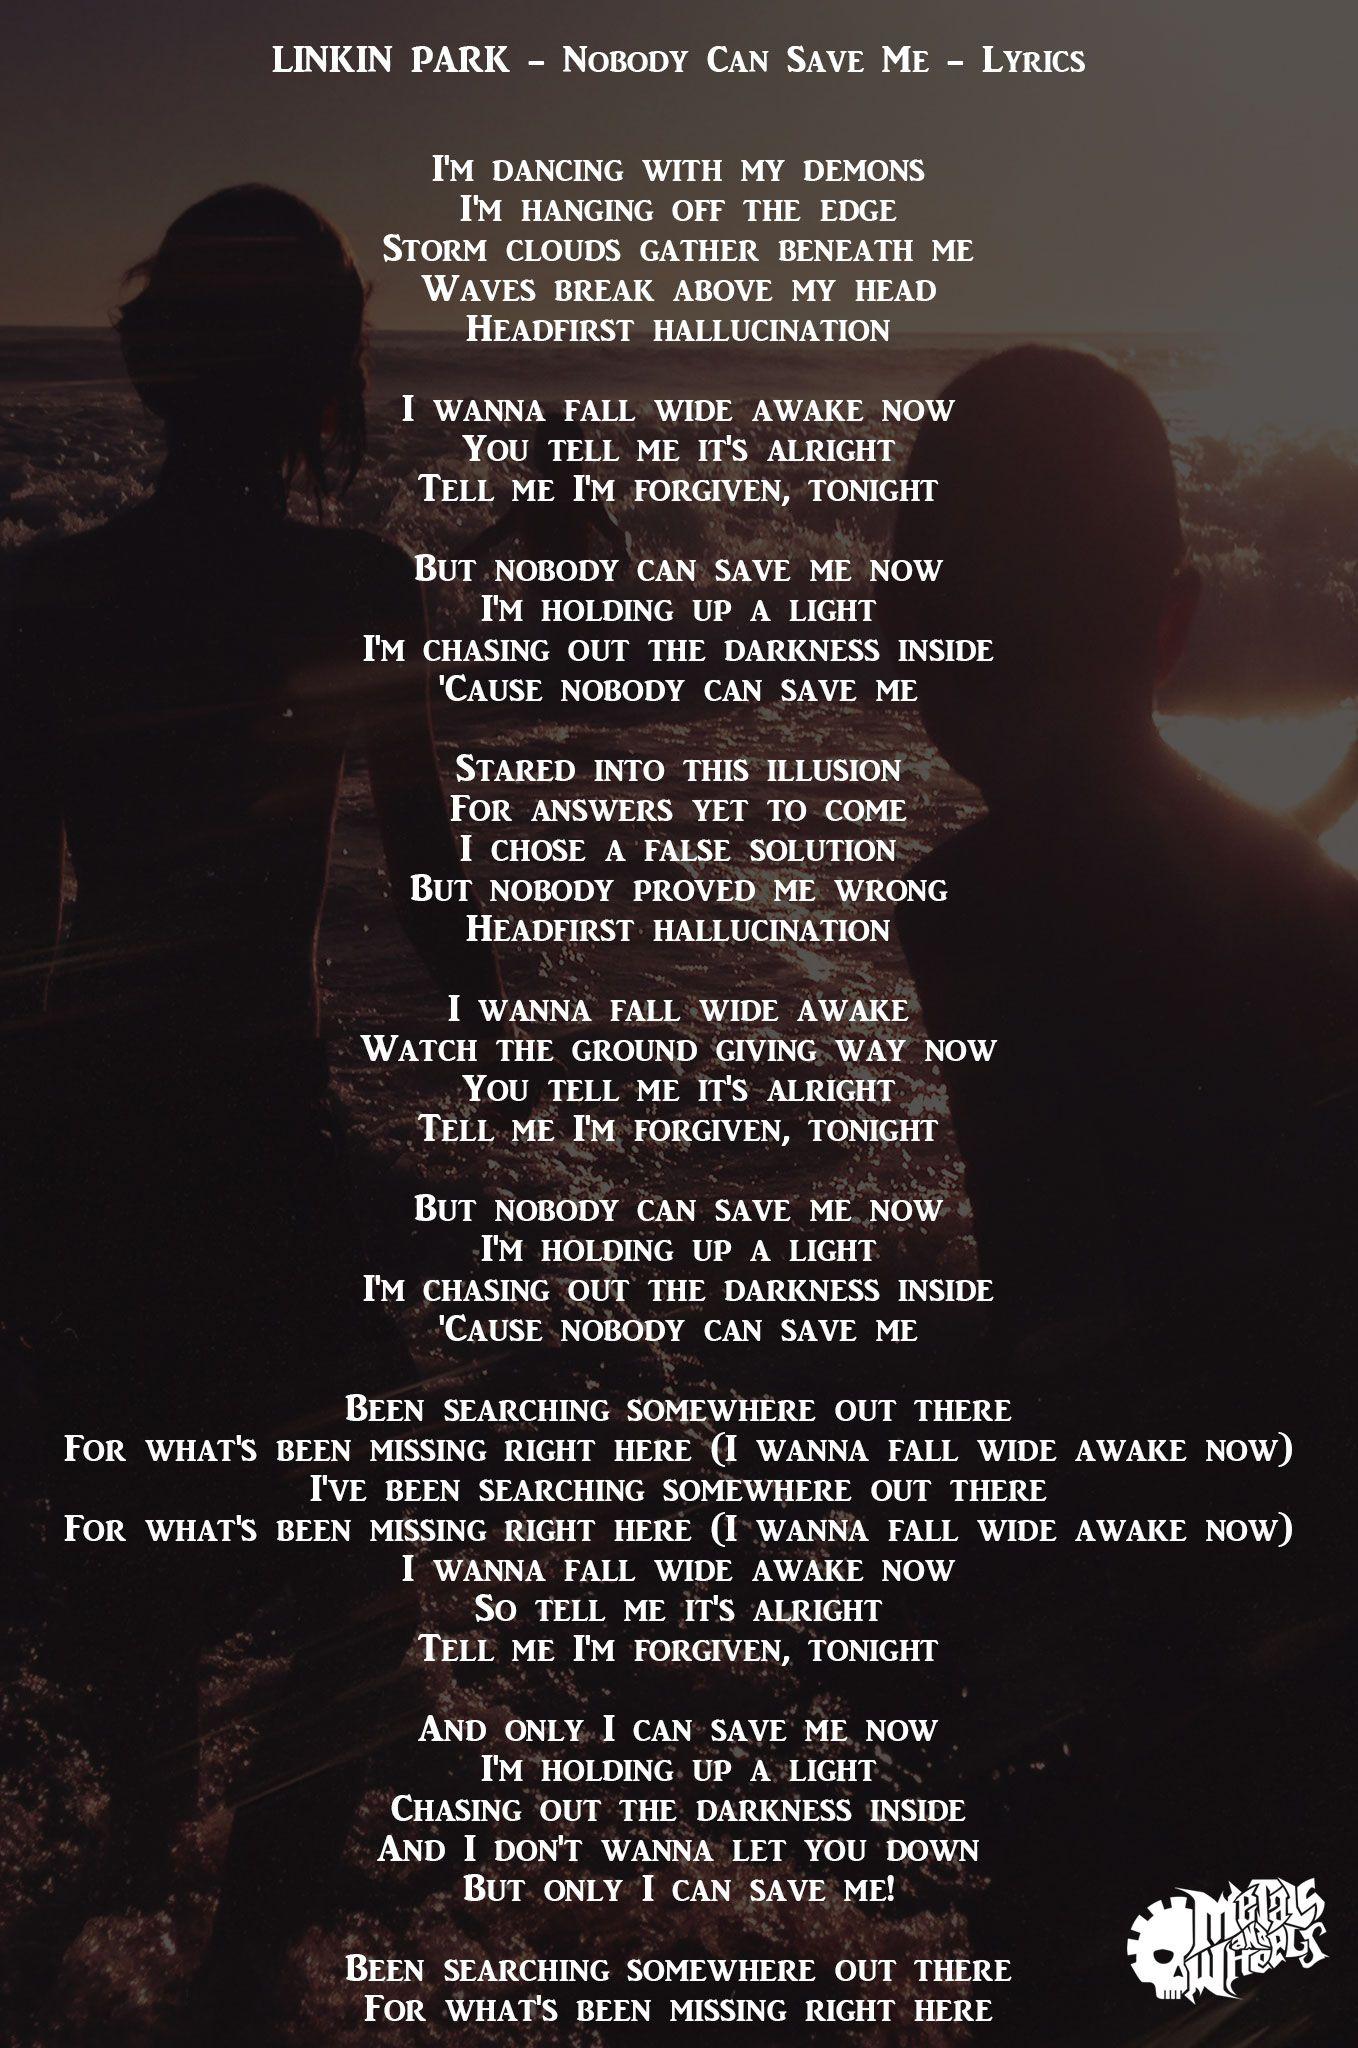 More One Linkin Light Lyrics Park